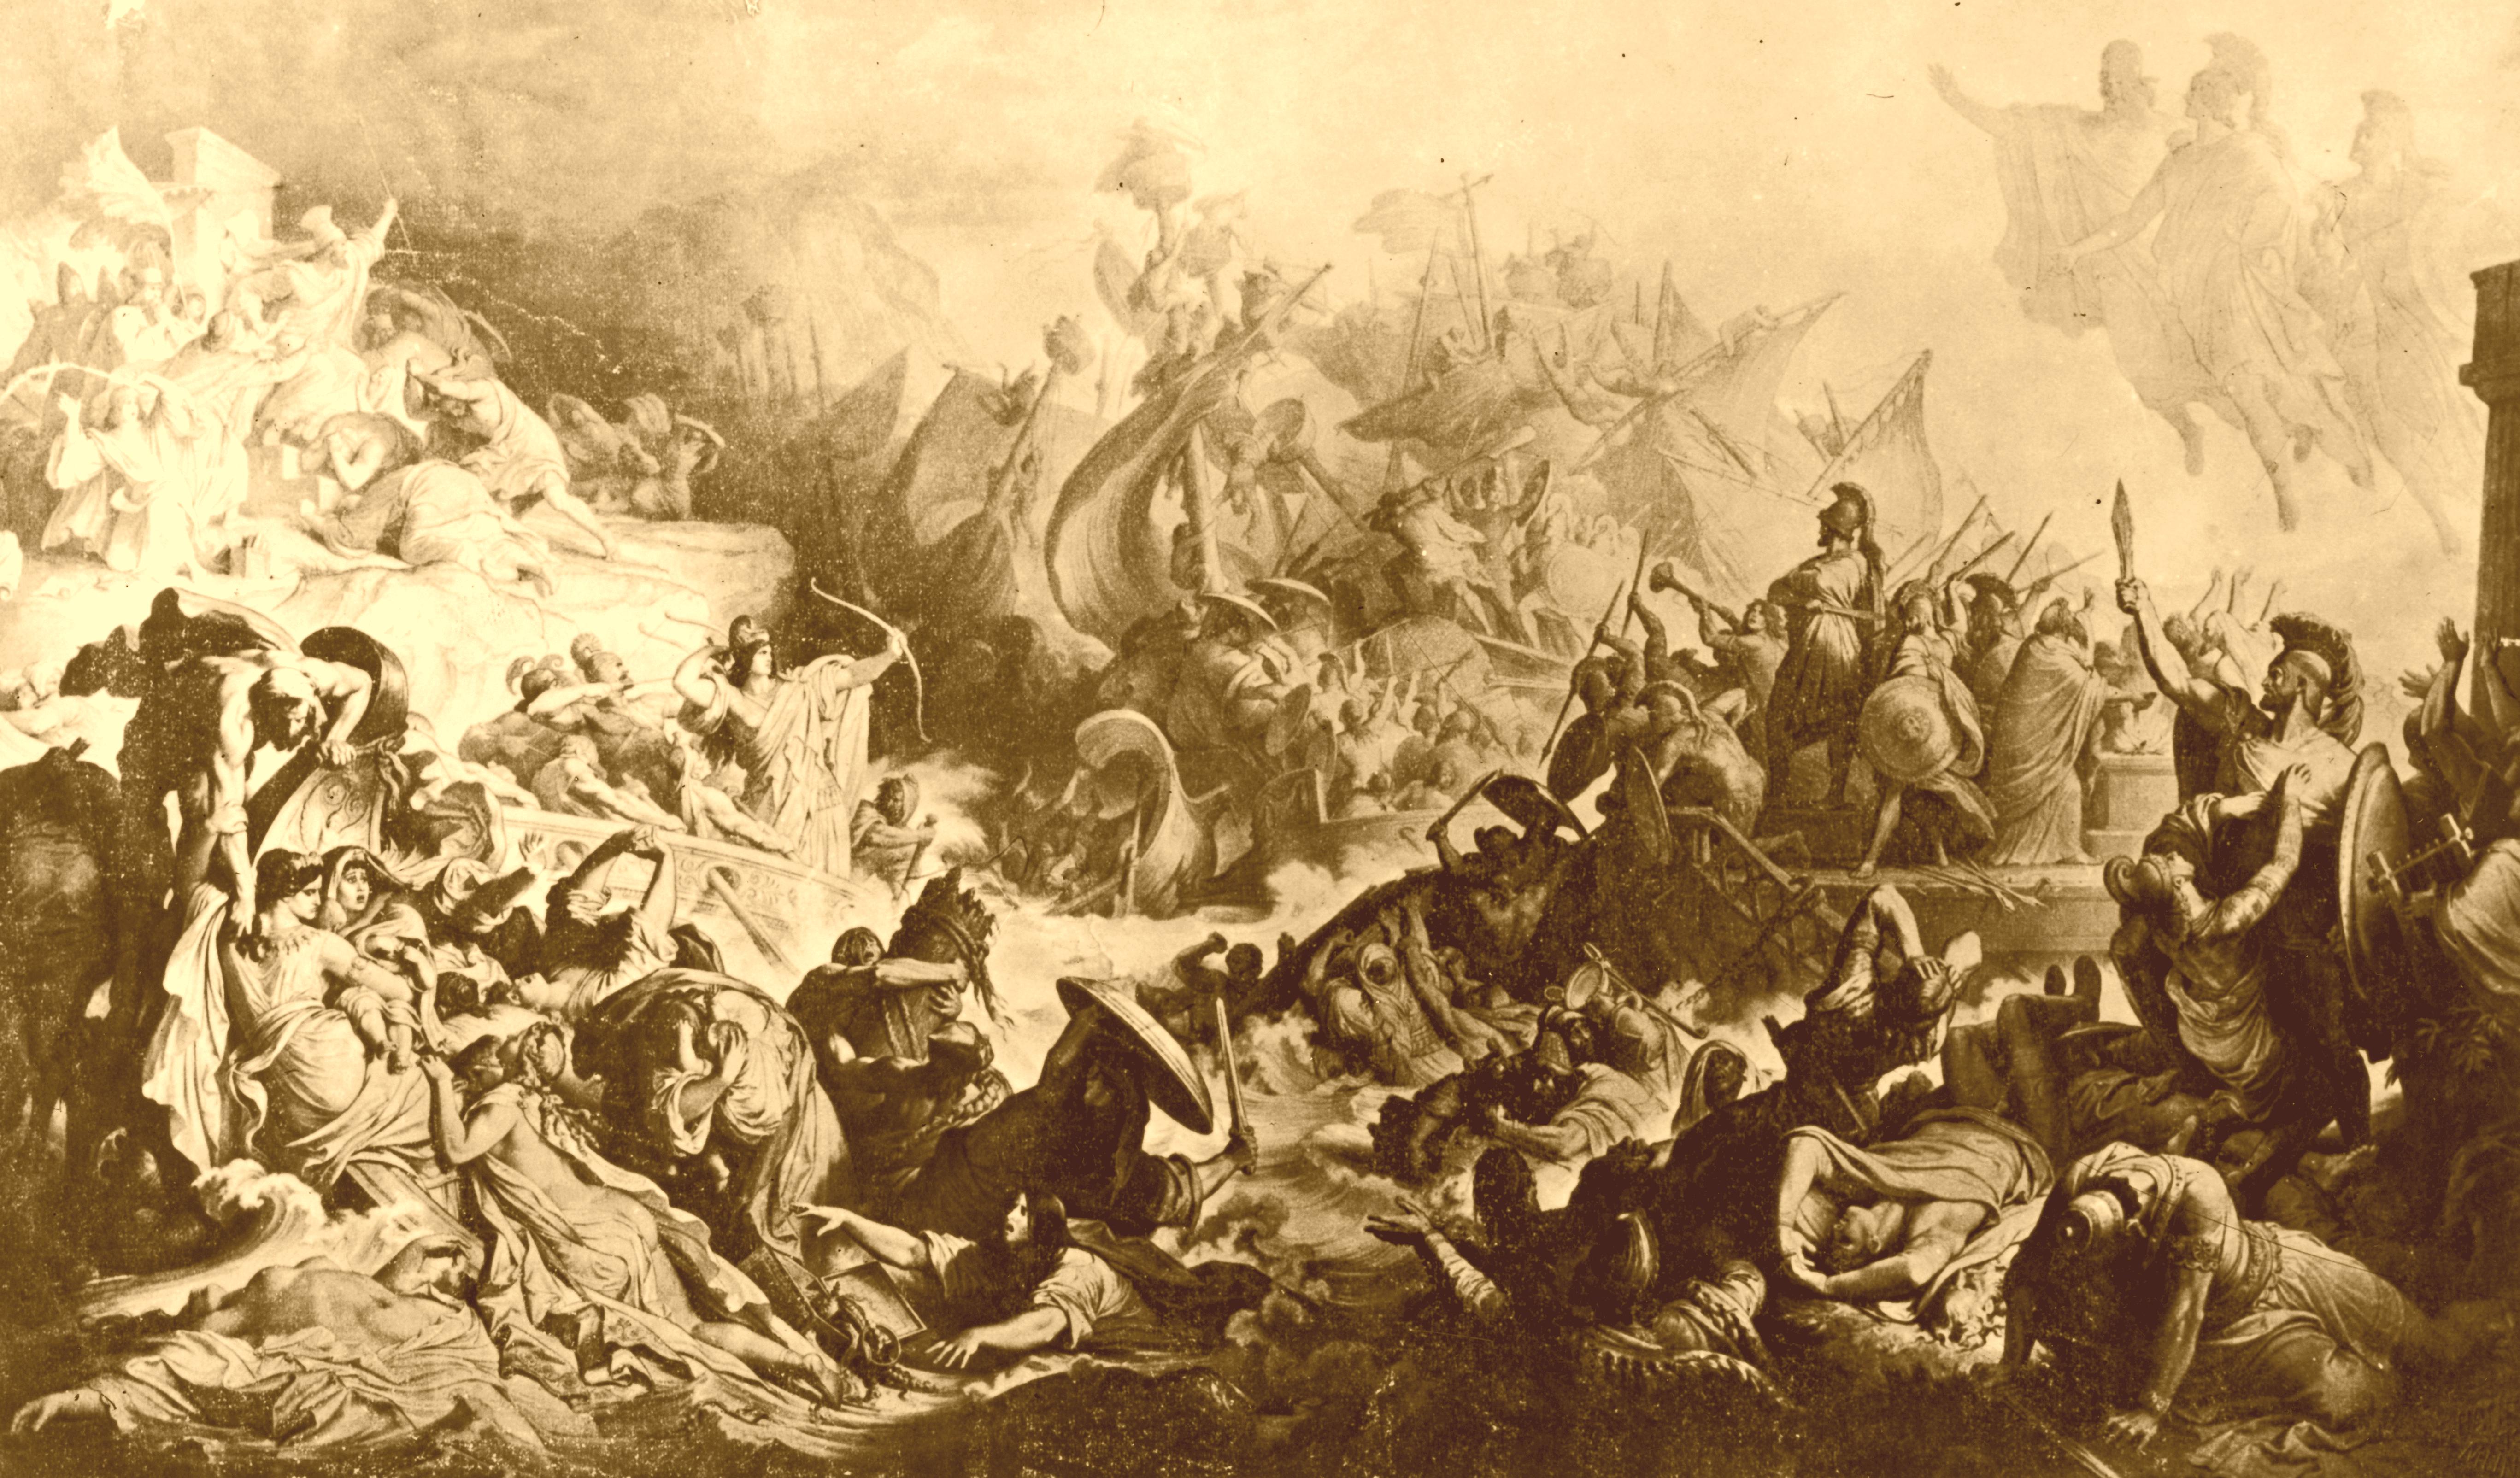 Naval Battle of Salamis